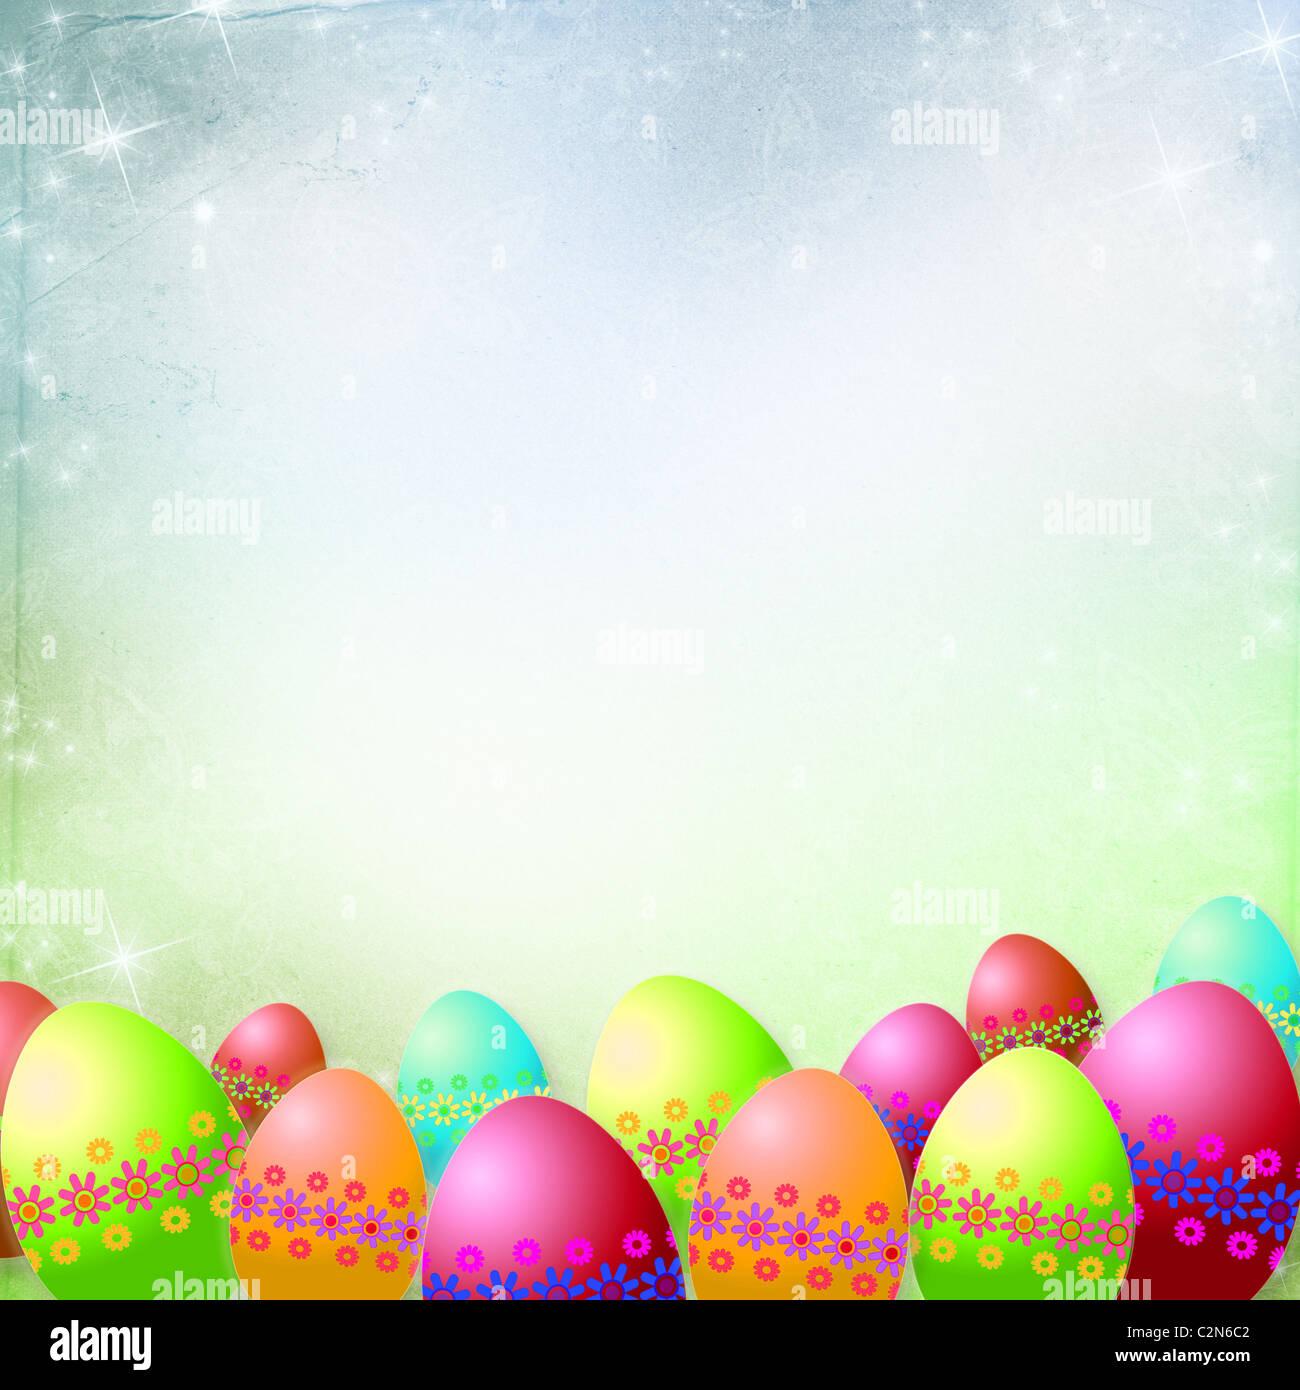 Resorte o antecedentes de Pascua y huevos de pascua con coloridas flores que cuelgan sobre cintas Foto de stock